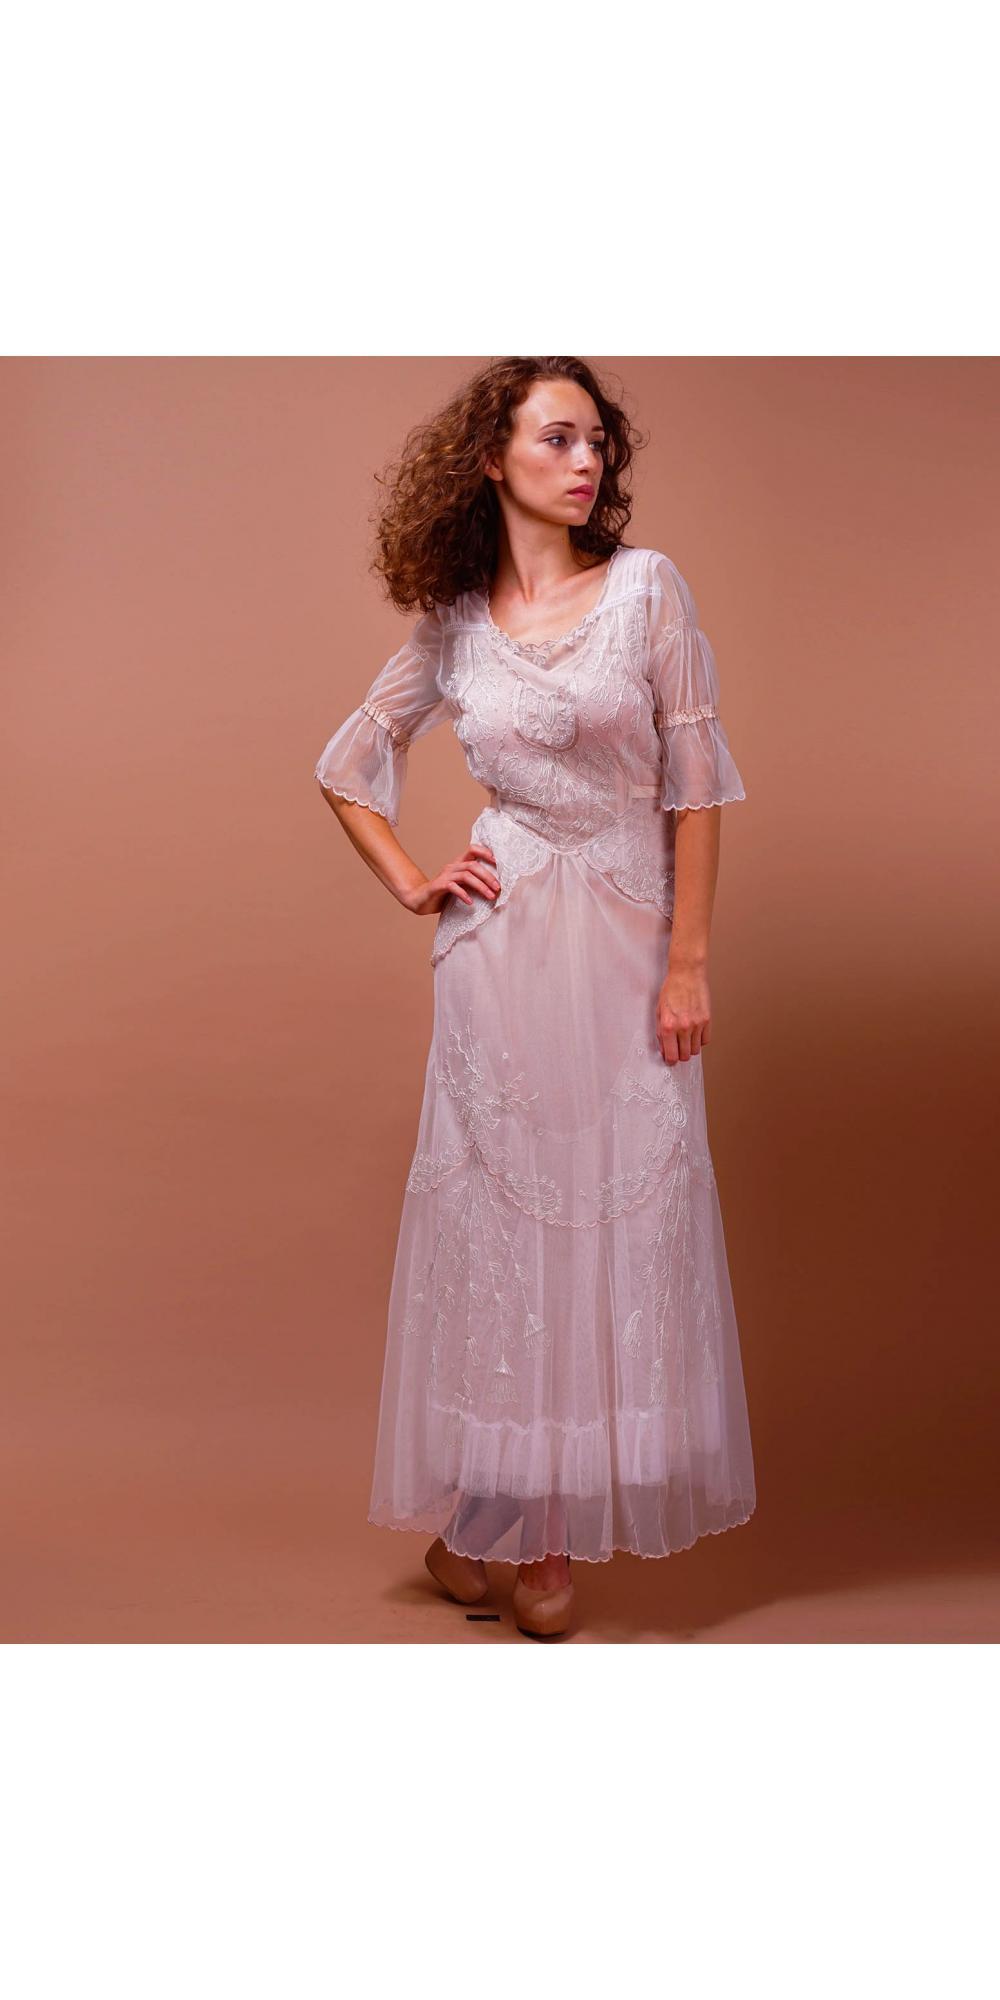 Edwardian vintage wedding dress in ivory blush by nataya for Vintage ivory wedding dresses